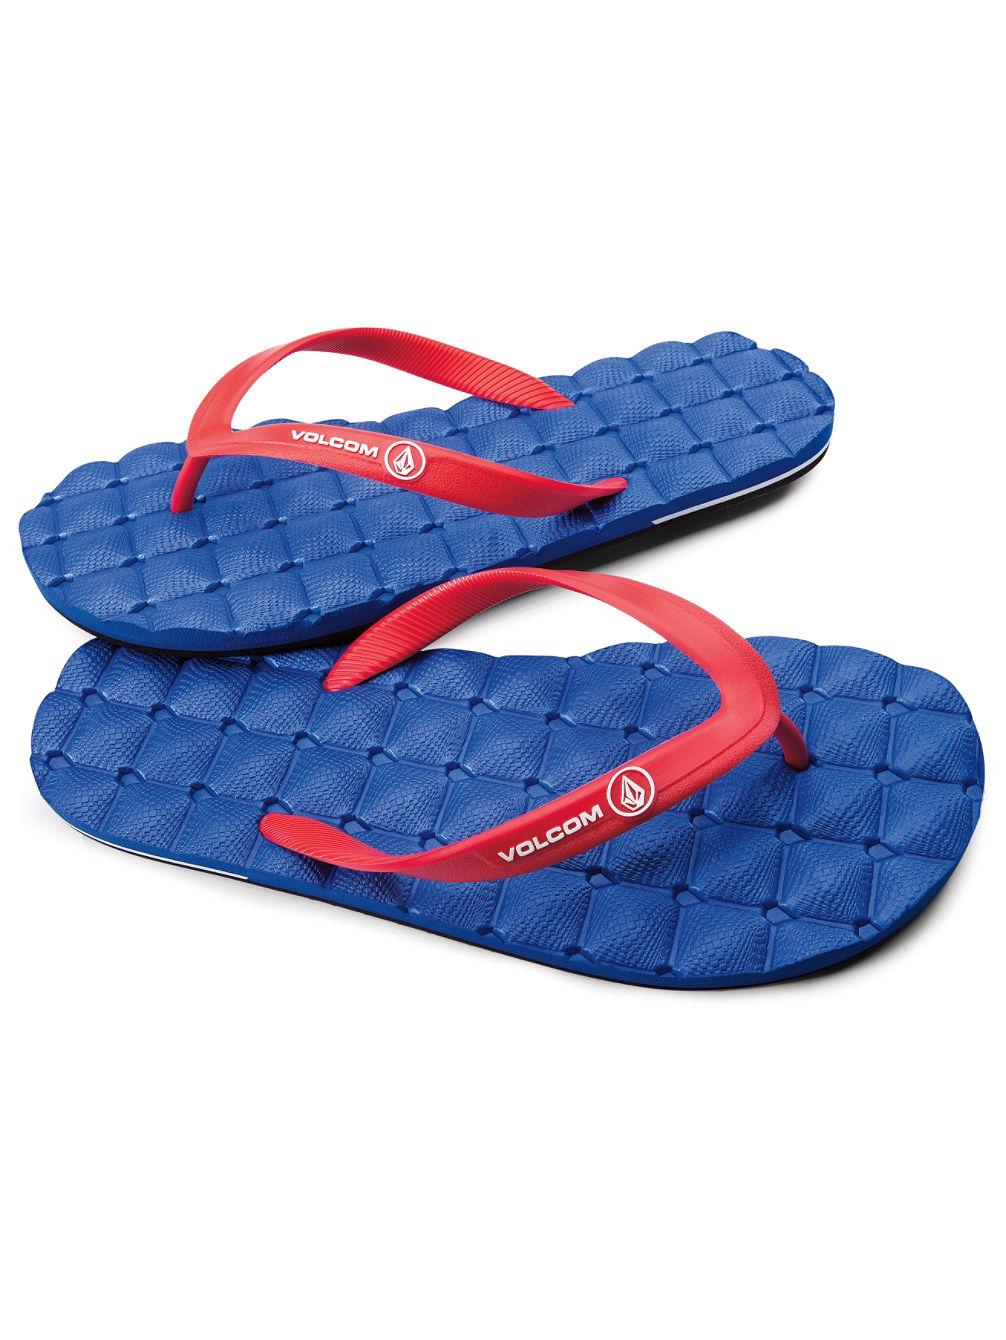 recliner-rubber-sandals